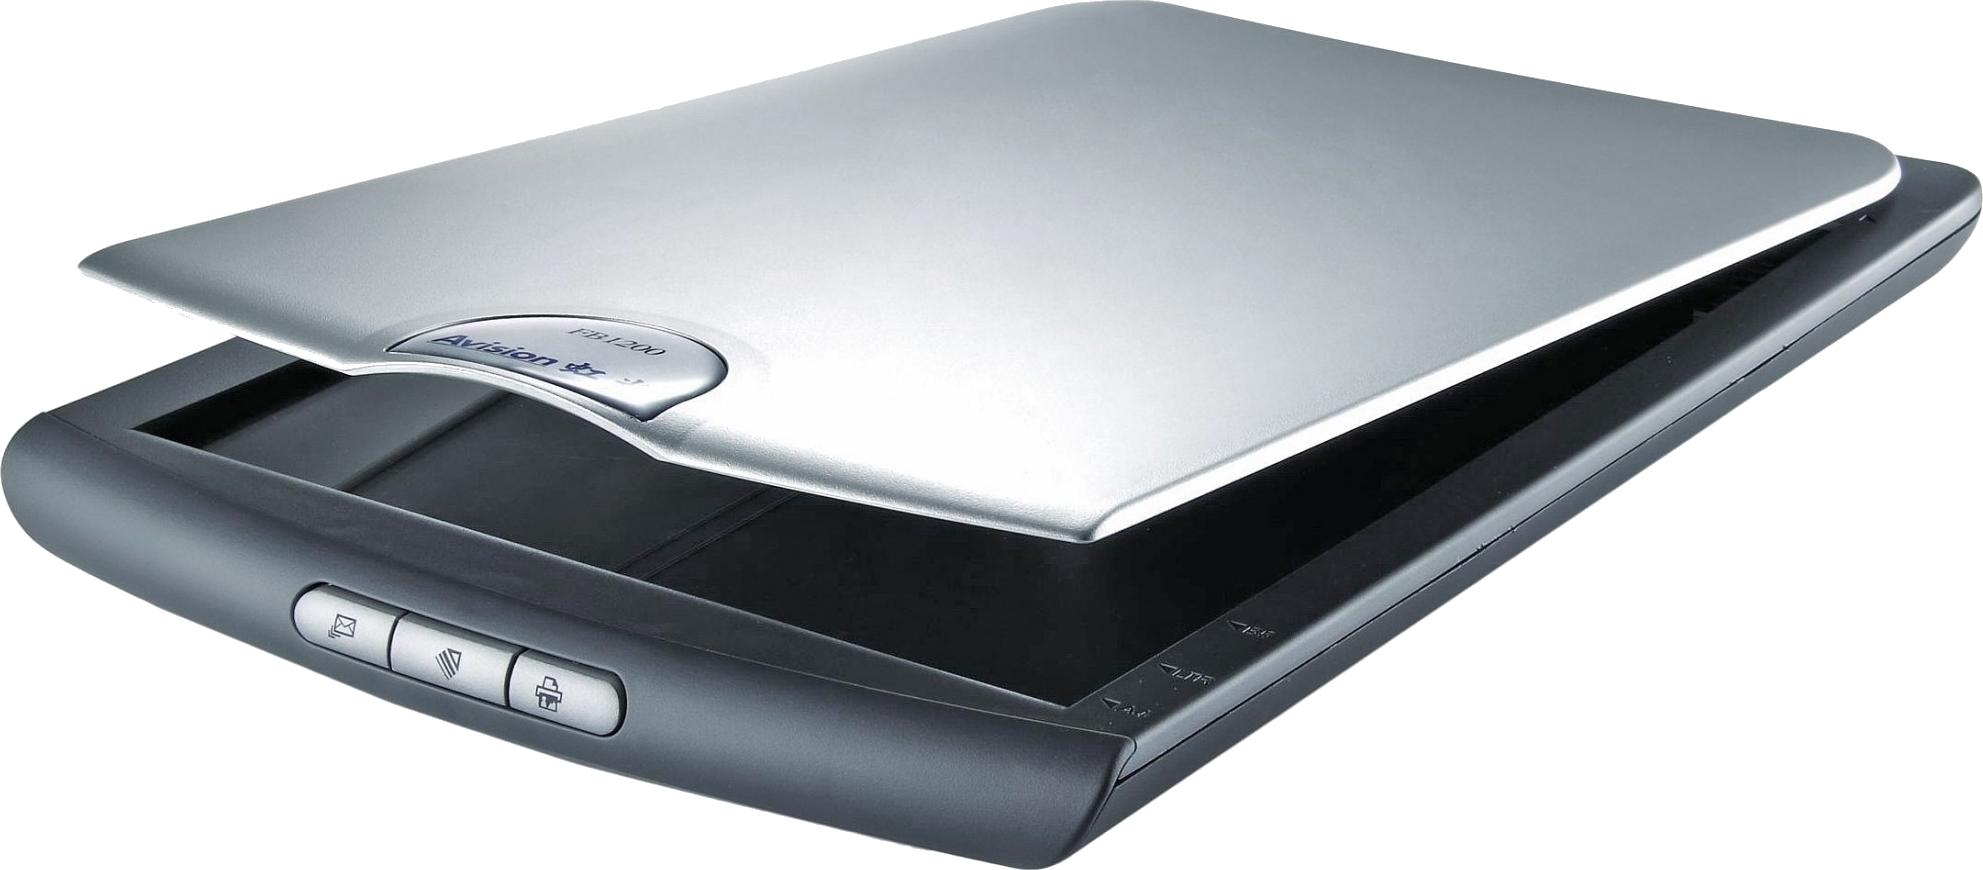 Scanner HD PNG - 95277